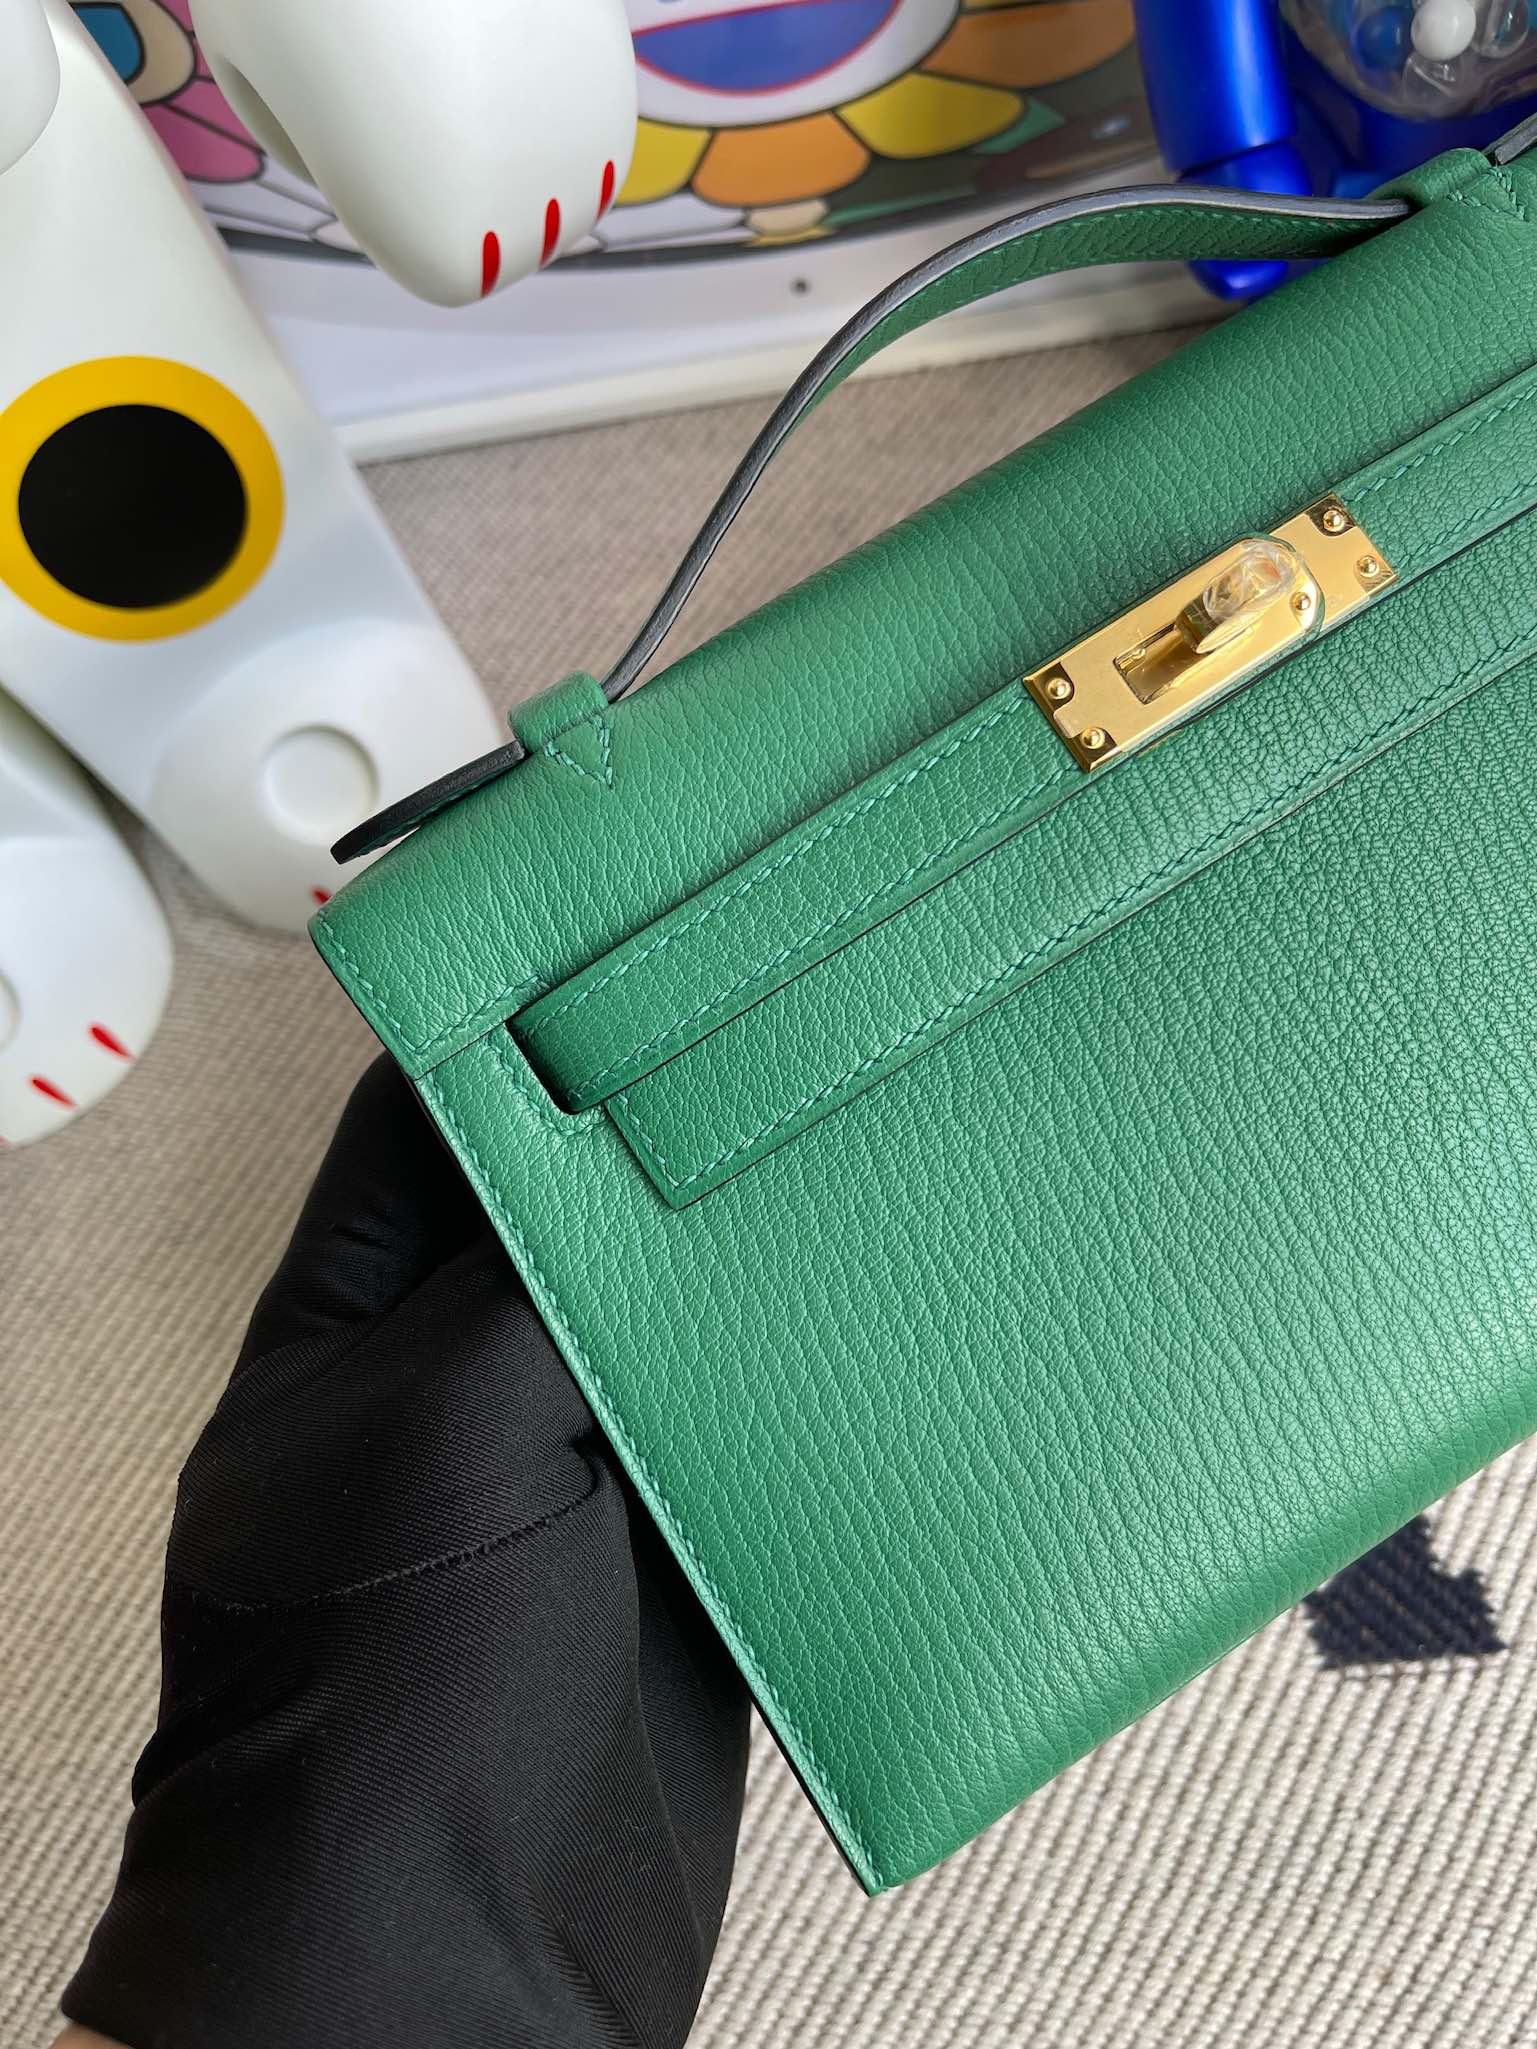 Hermès(爱马仕)Mini kelly pochette Chevre 山羊皮 U4 丝绒绿 vert verigo 金扣 22cm 顶级手缝